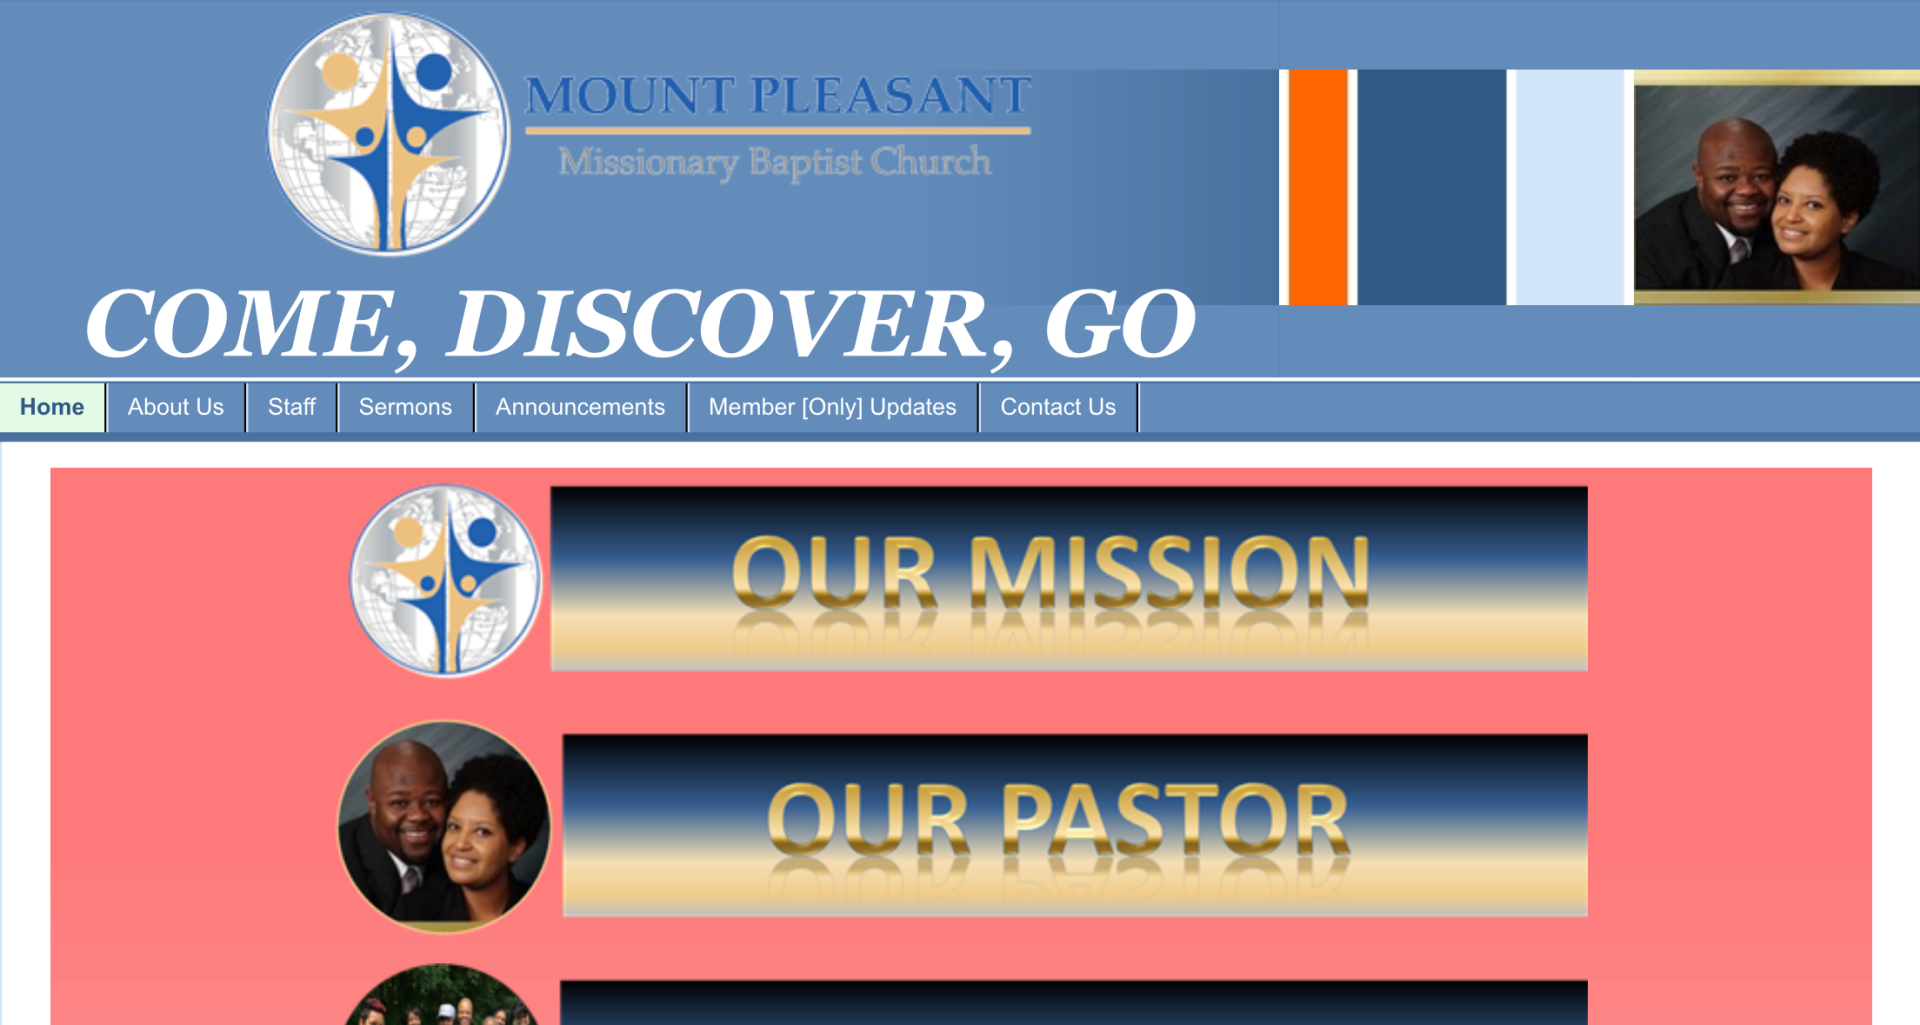 MOUNT PLEASANT MISSIONARY BAPTIST CHURCH